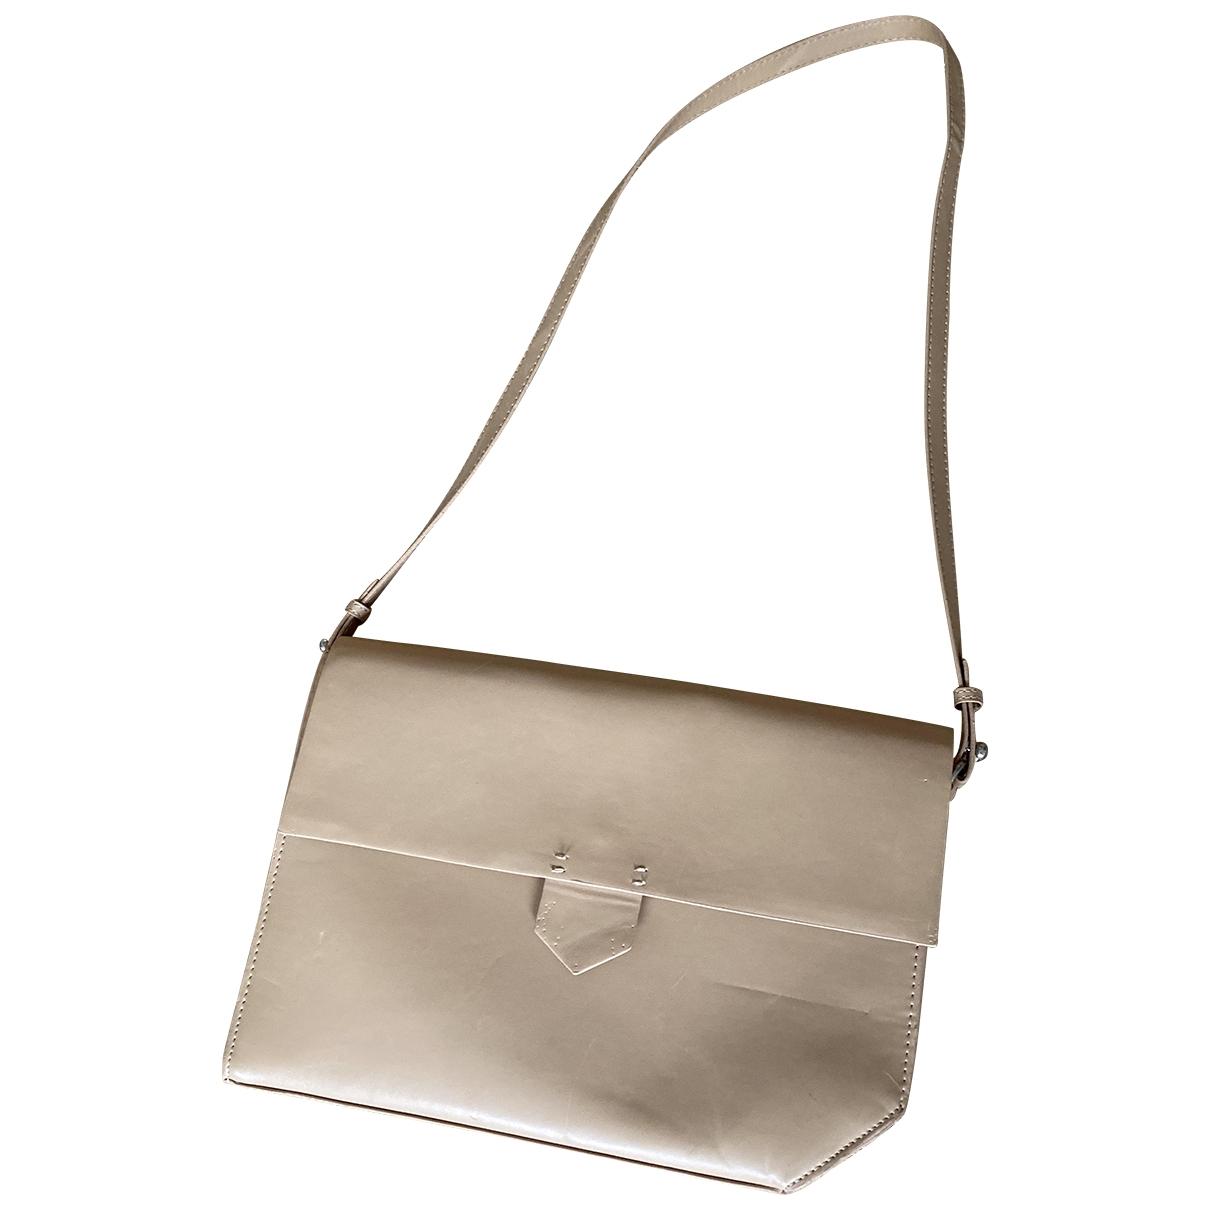 Zara \N Pink handbag for Women \N